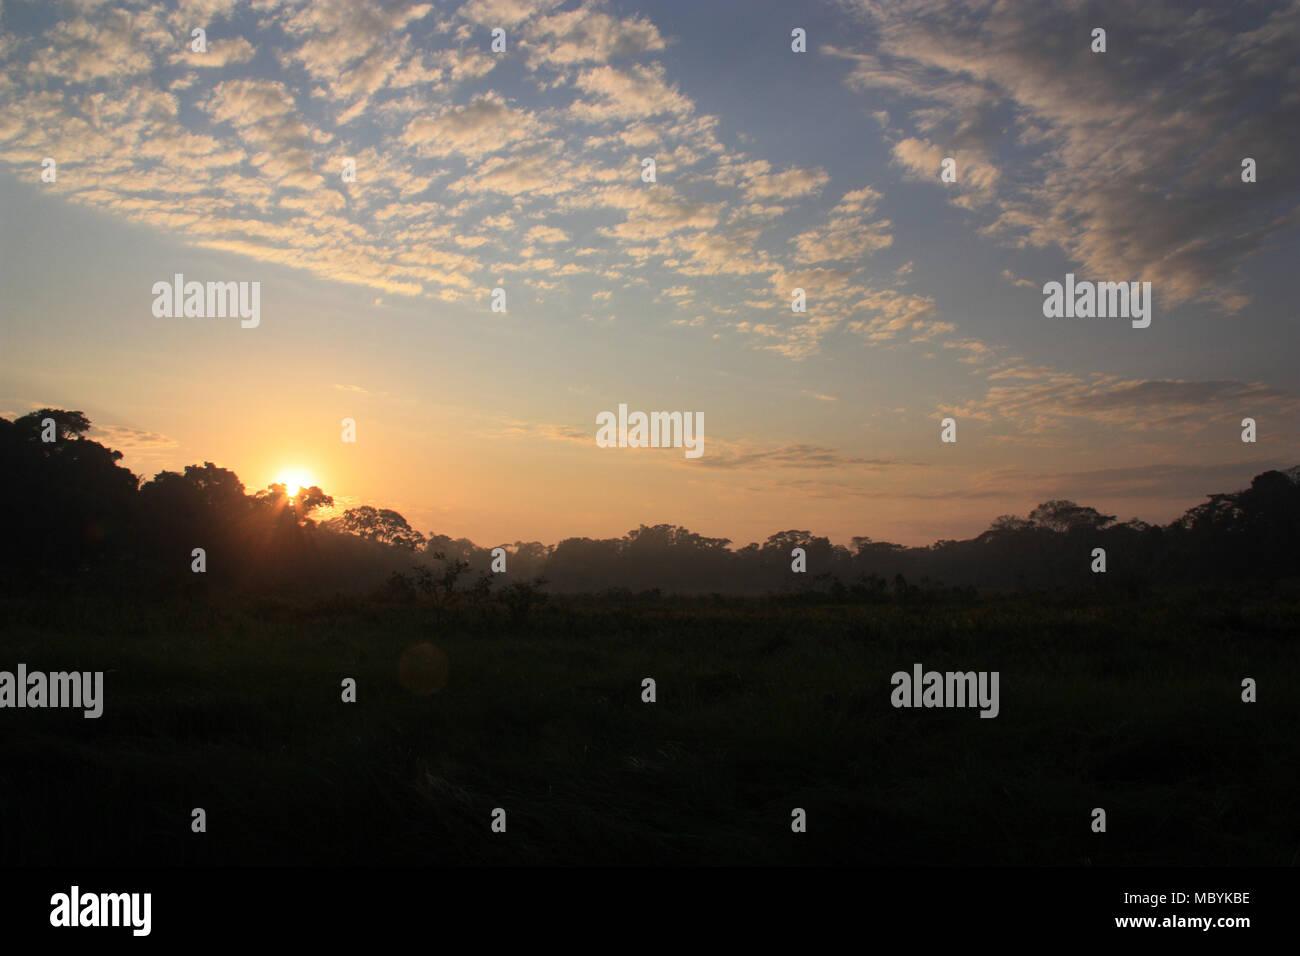 Sonnenaufgang in den Regenwald des Amazonas, Tambopata National Reserve, Puerto Maldonado, Peru Stockbild